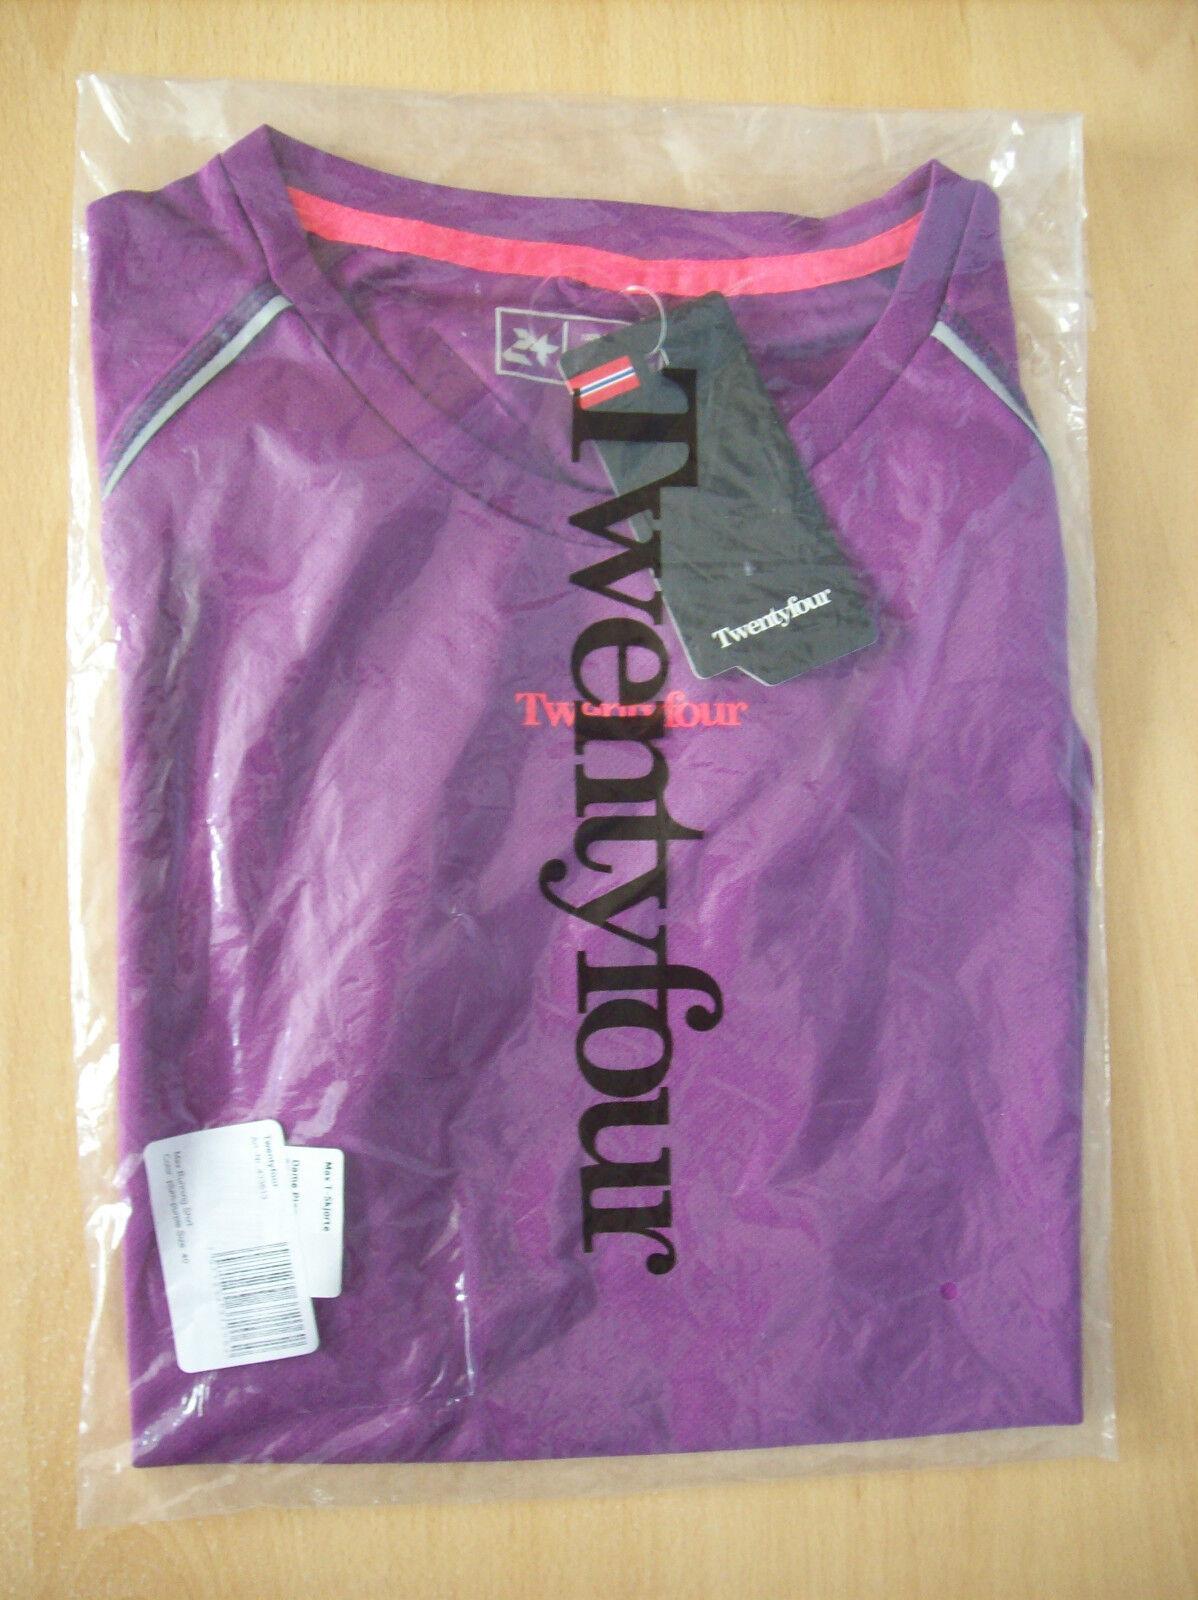 Shirt Ladies Twentyfour Max Running Shirt Plum Purple Size 40 New Sealed + Tags